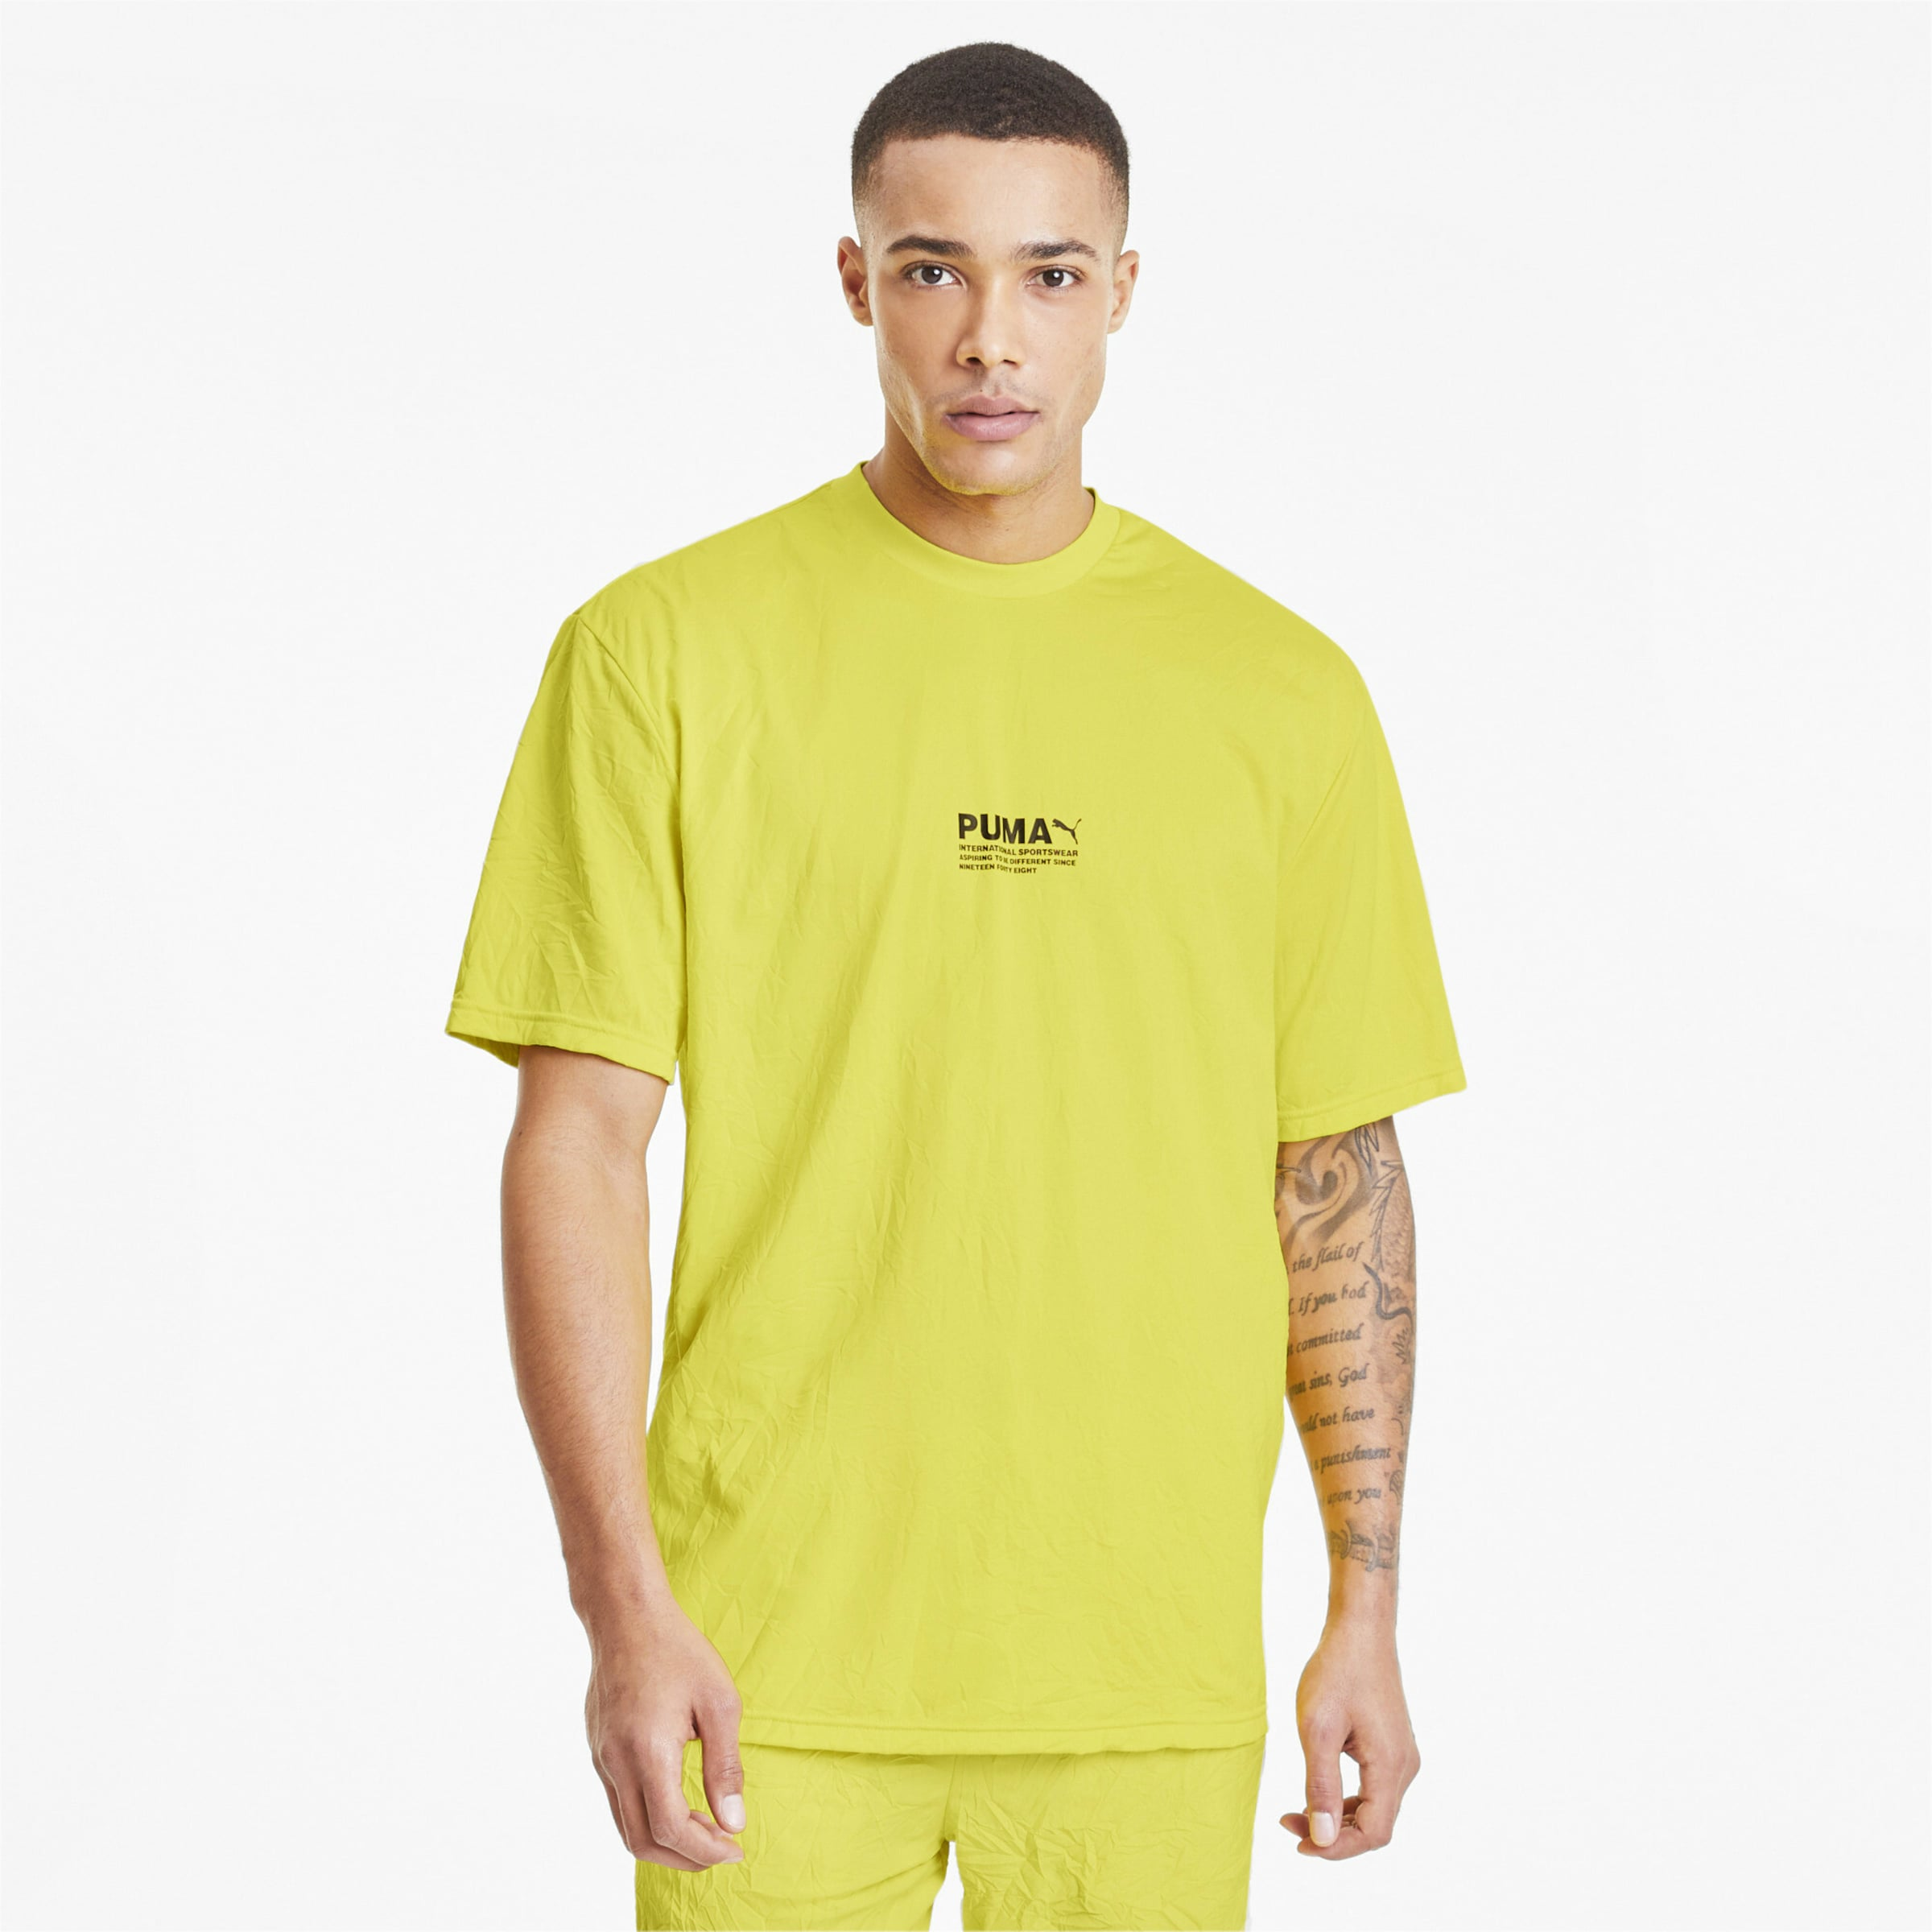 PUMA Shirt 'Avenir' in neongelb Rundhals-Ausschnitt 4062451055301